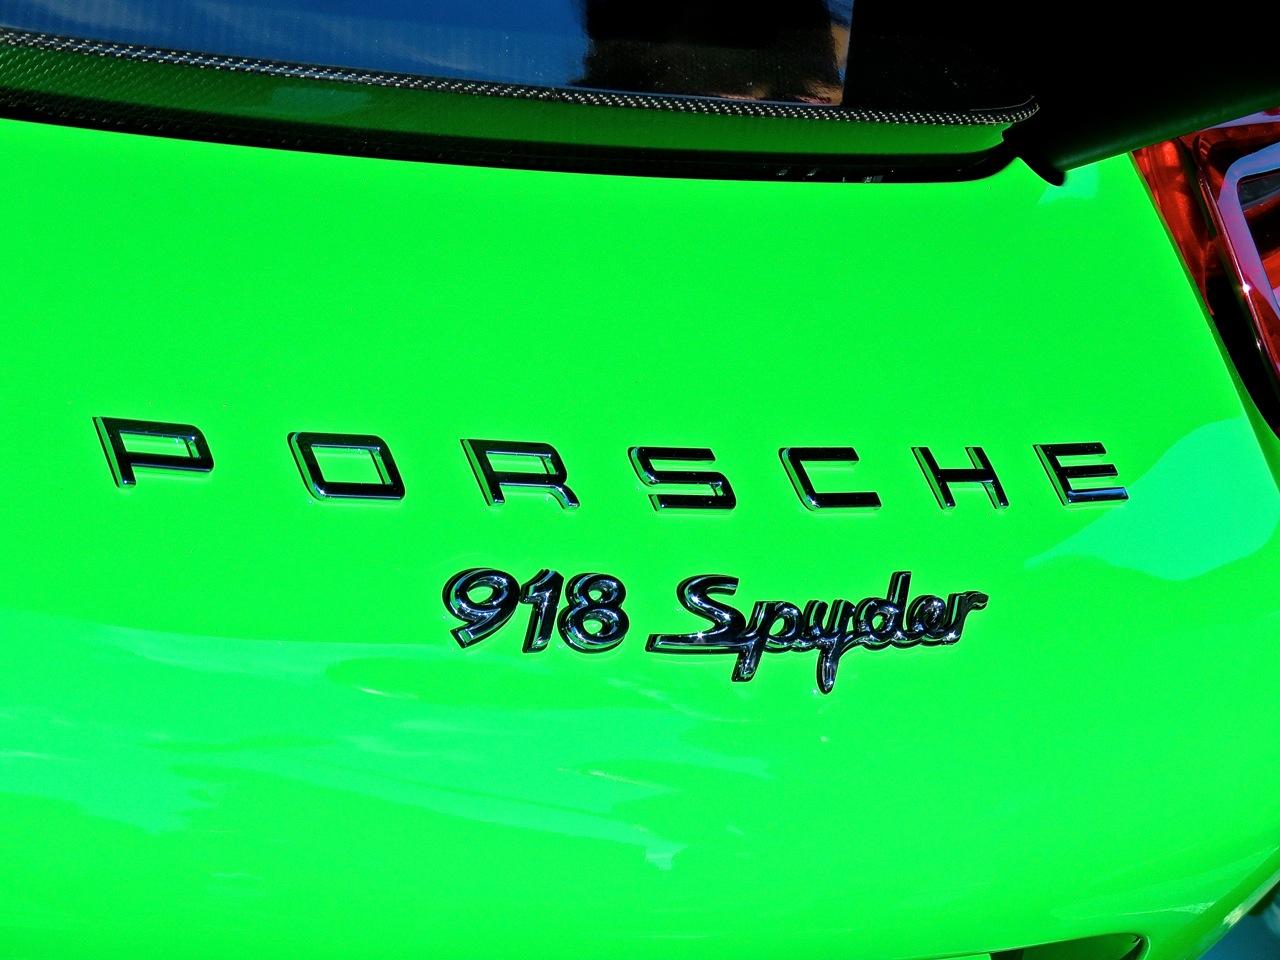 Green Porsche 918 Cars and Caffe 3